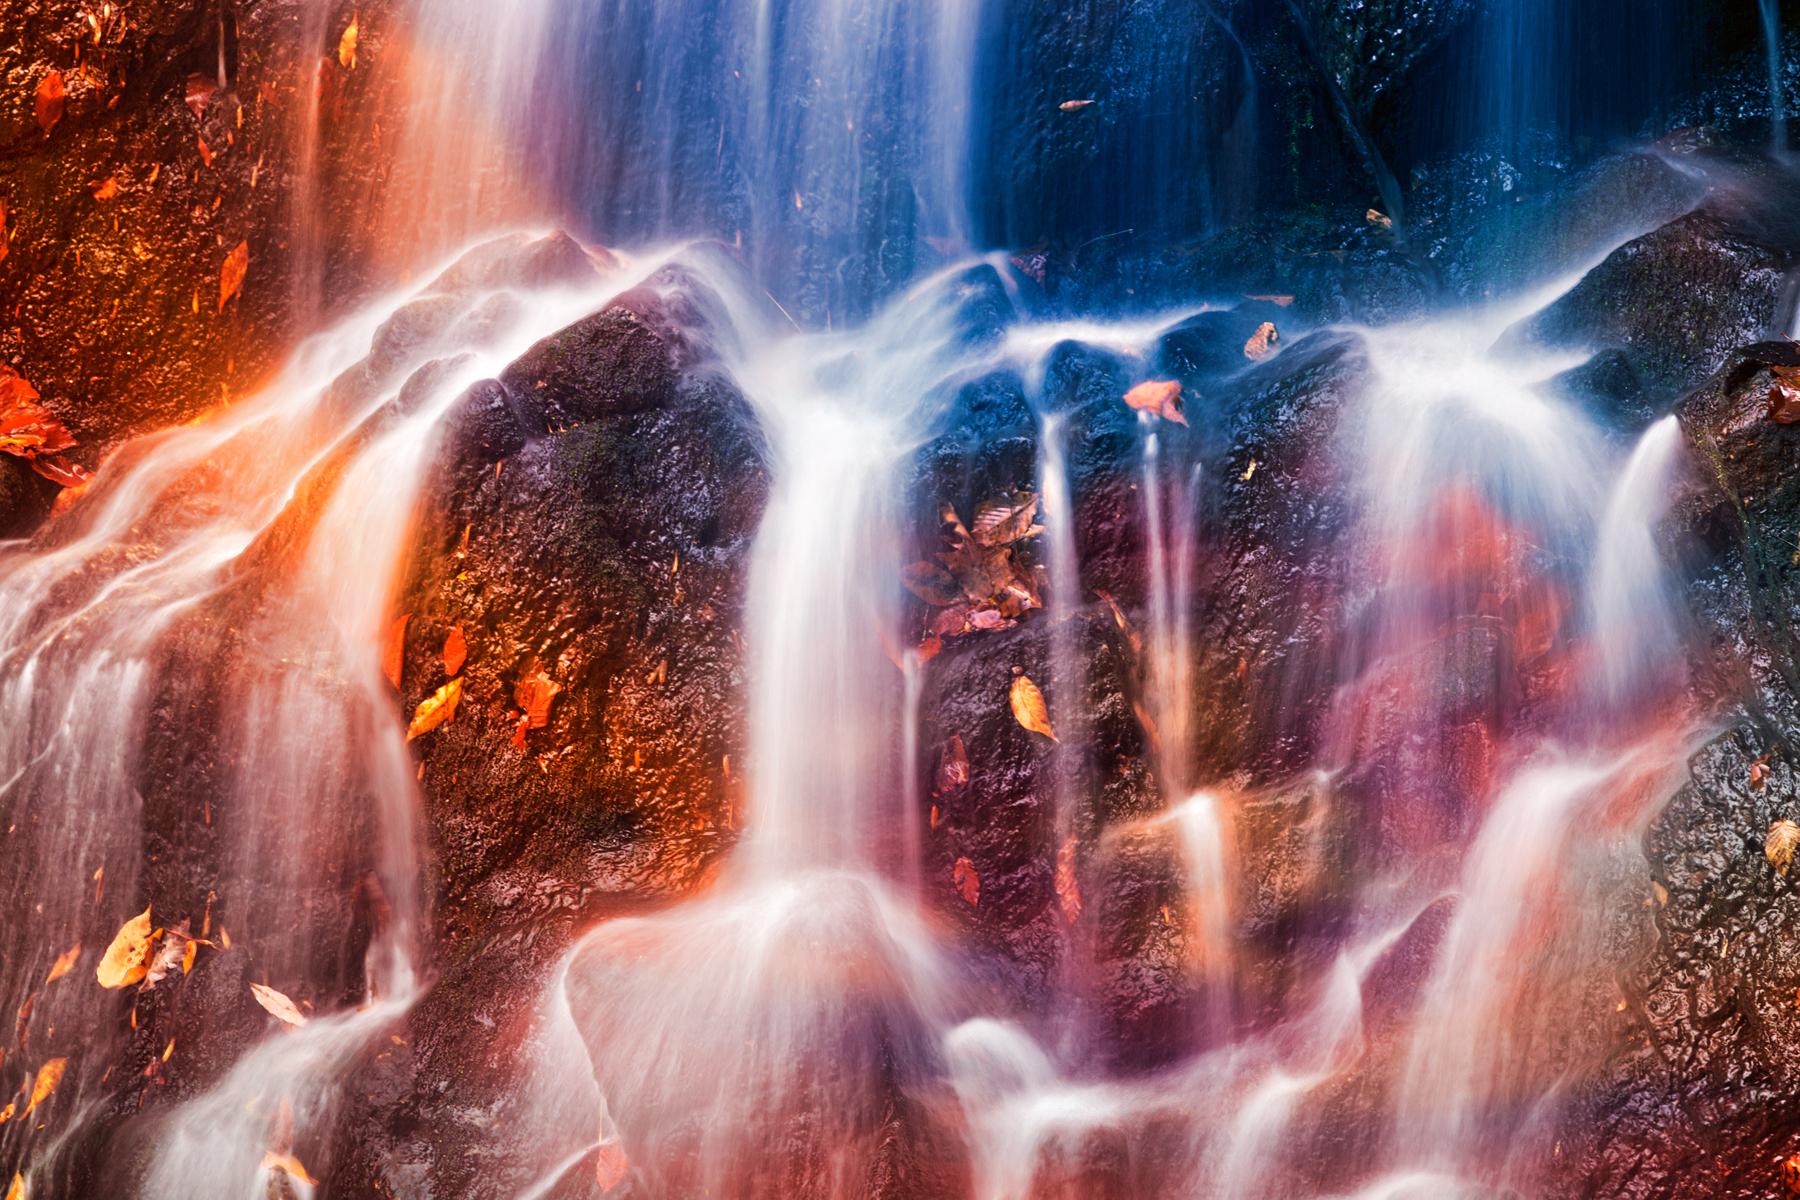 Vibrant Sky Falls, Abstract, Patapsco, Scenic, Scenery, HQ Photo